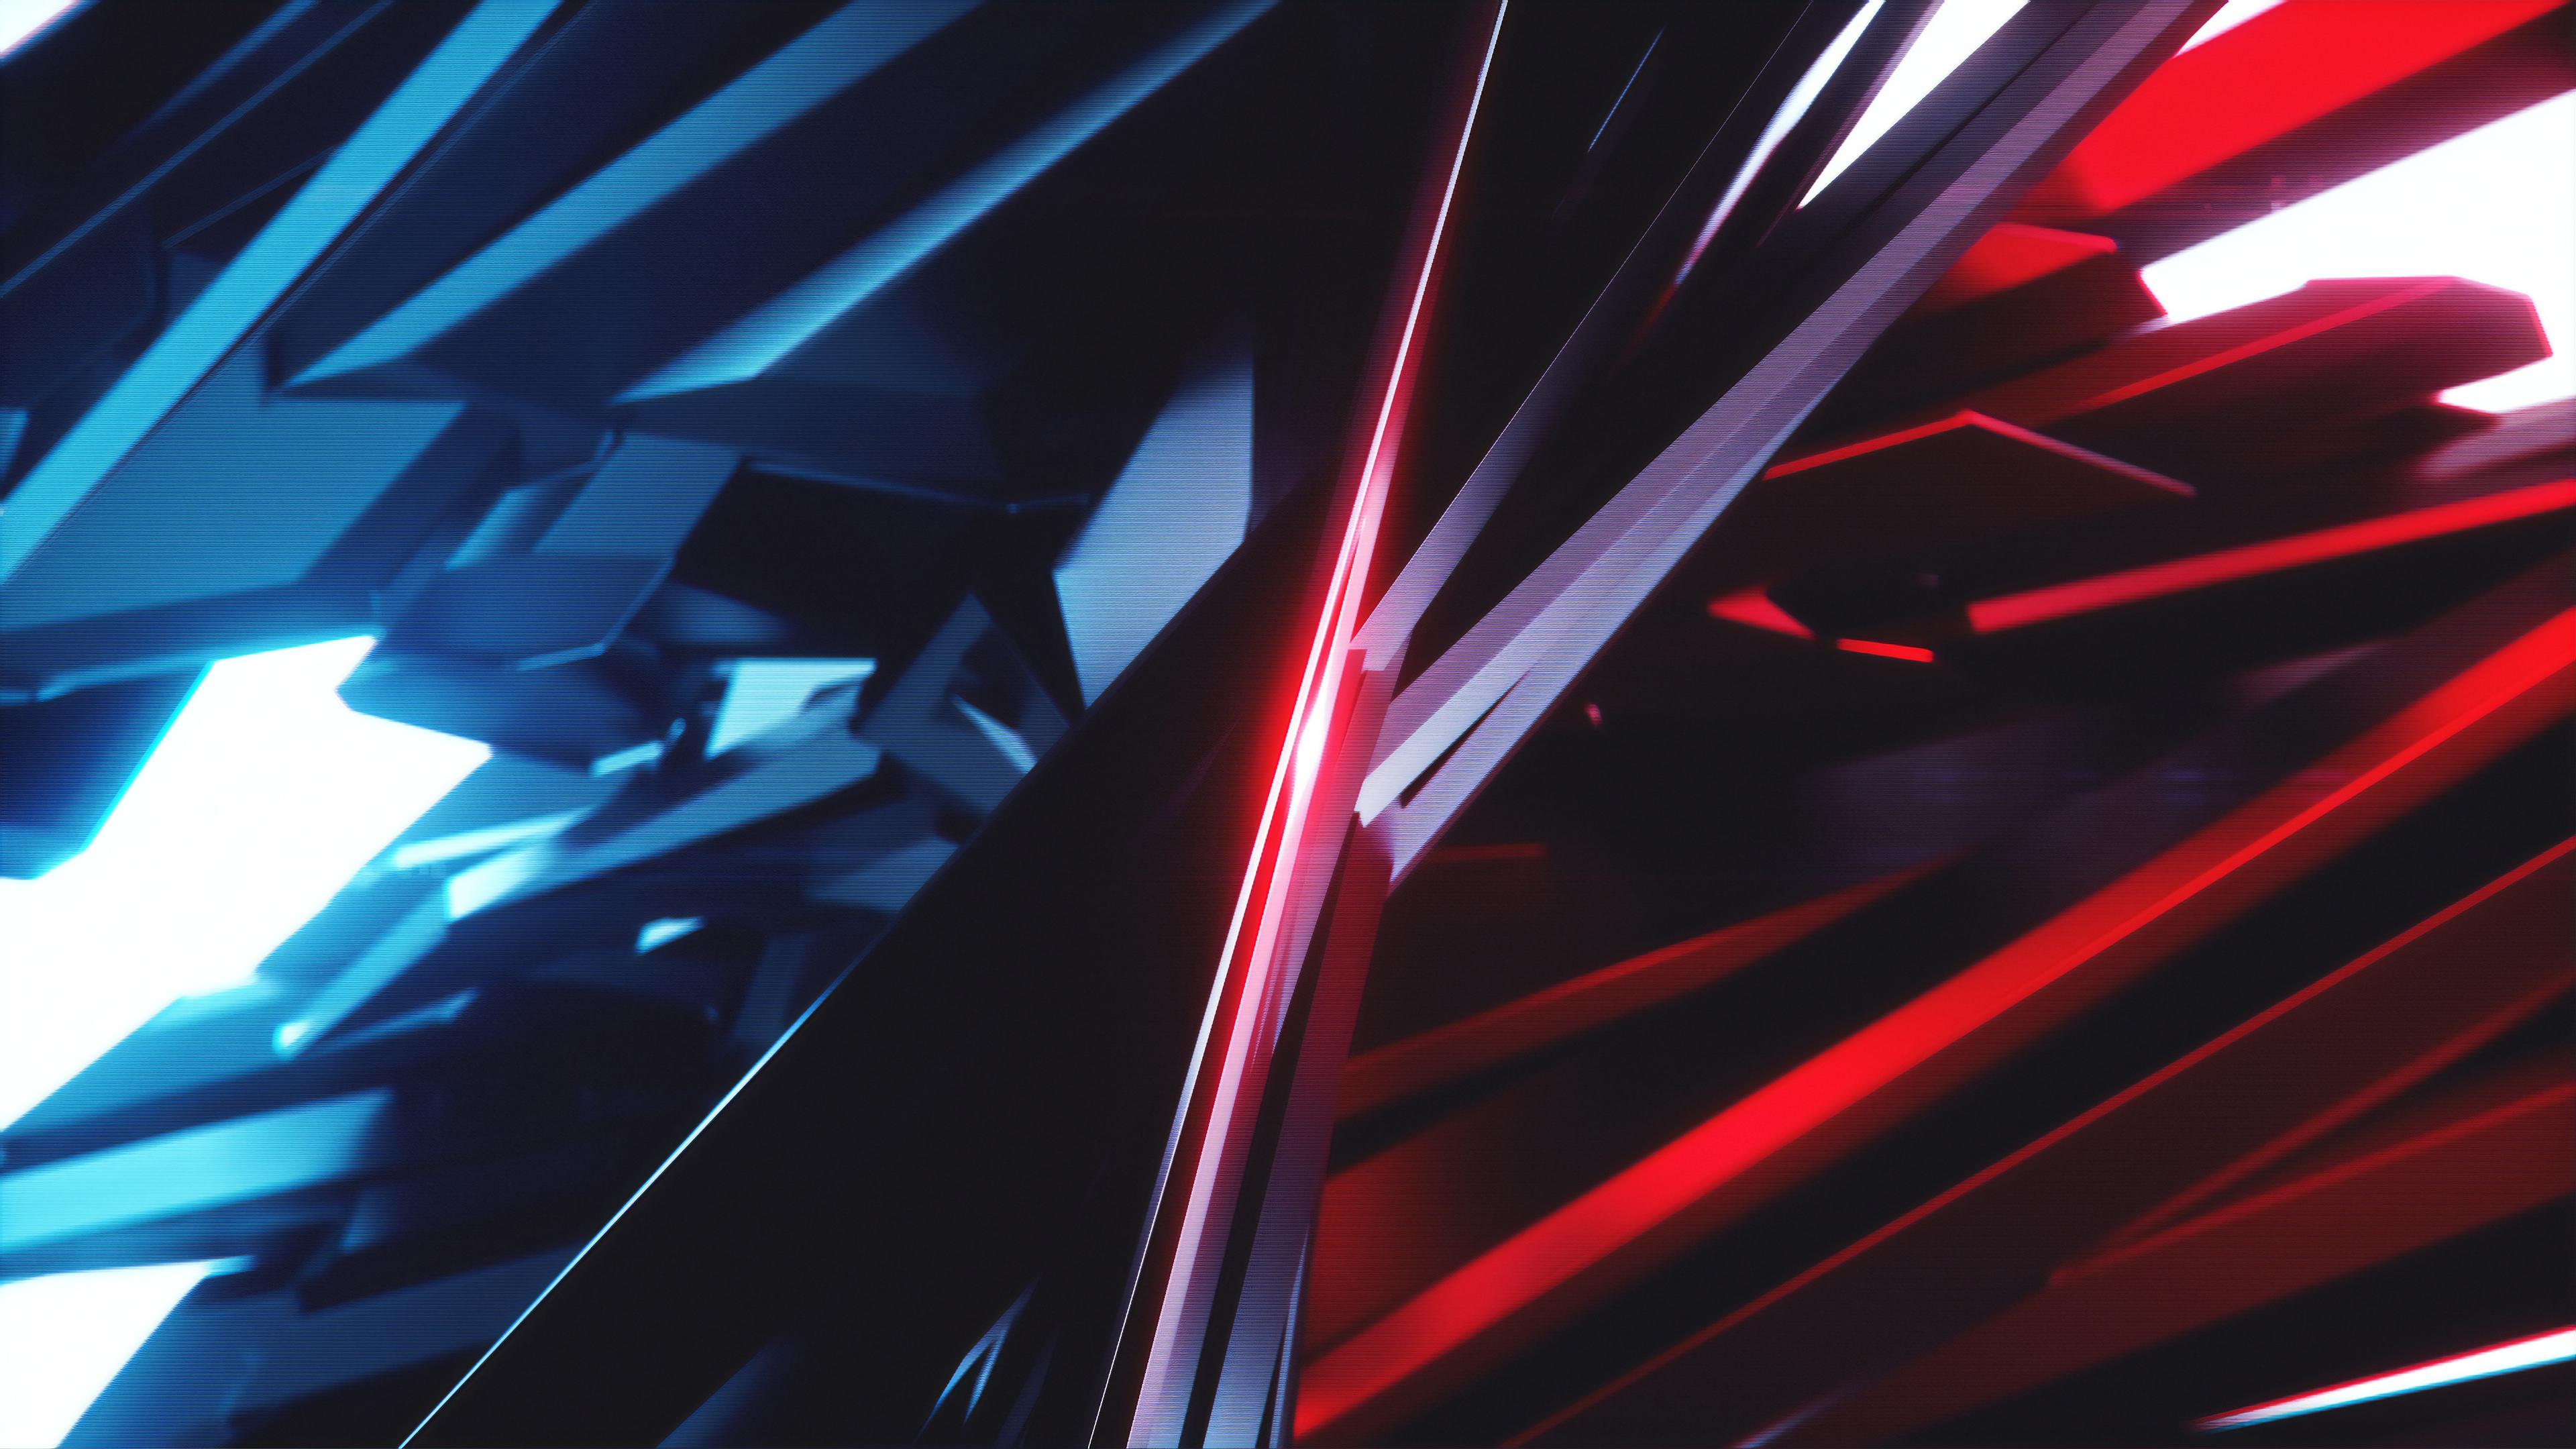 sharp-shapes-3d-abstract-art-4k-n7.jpg